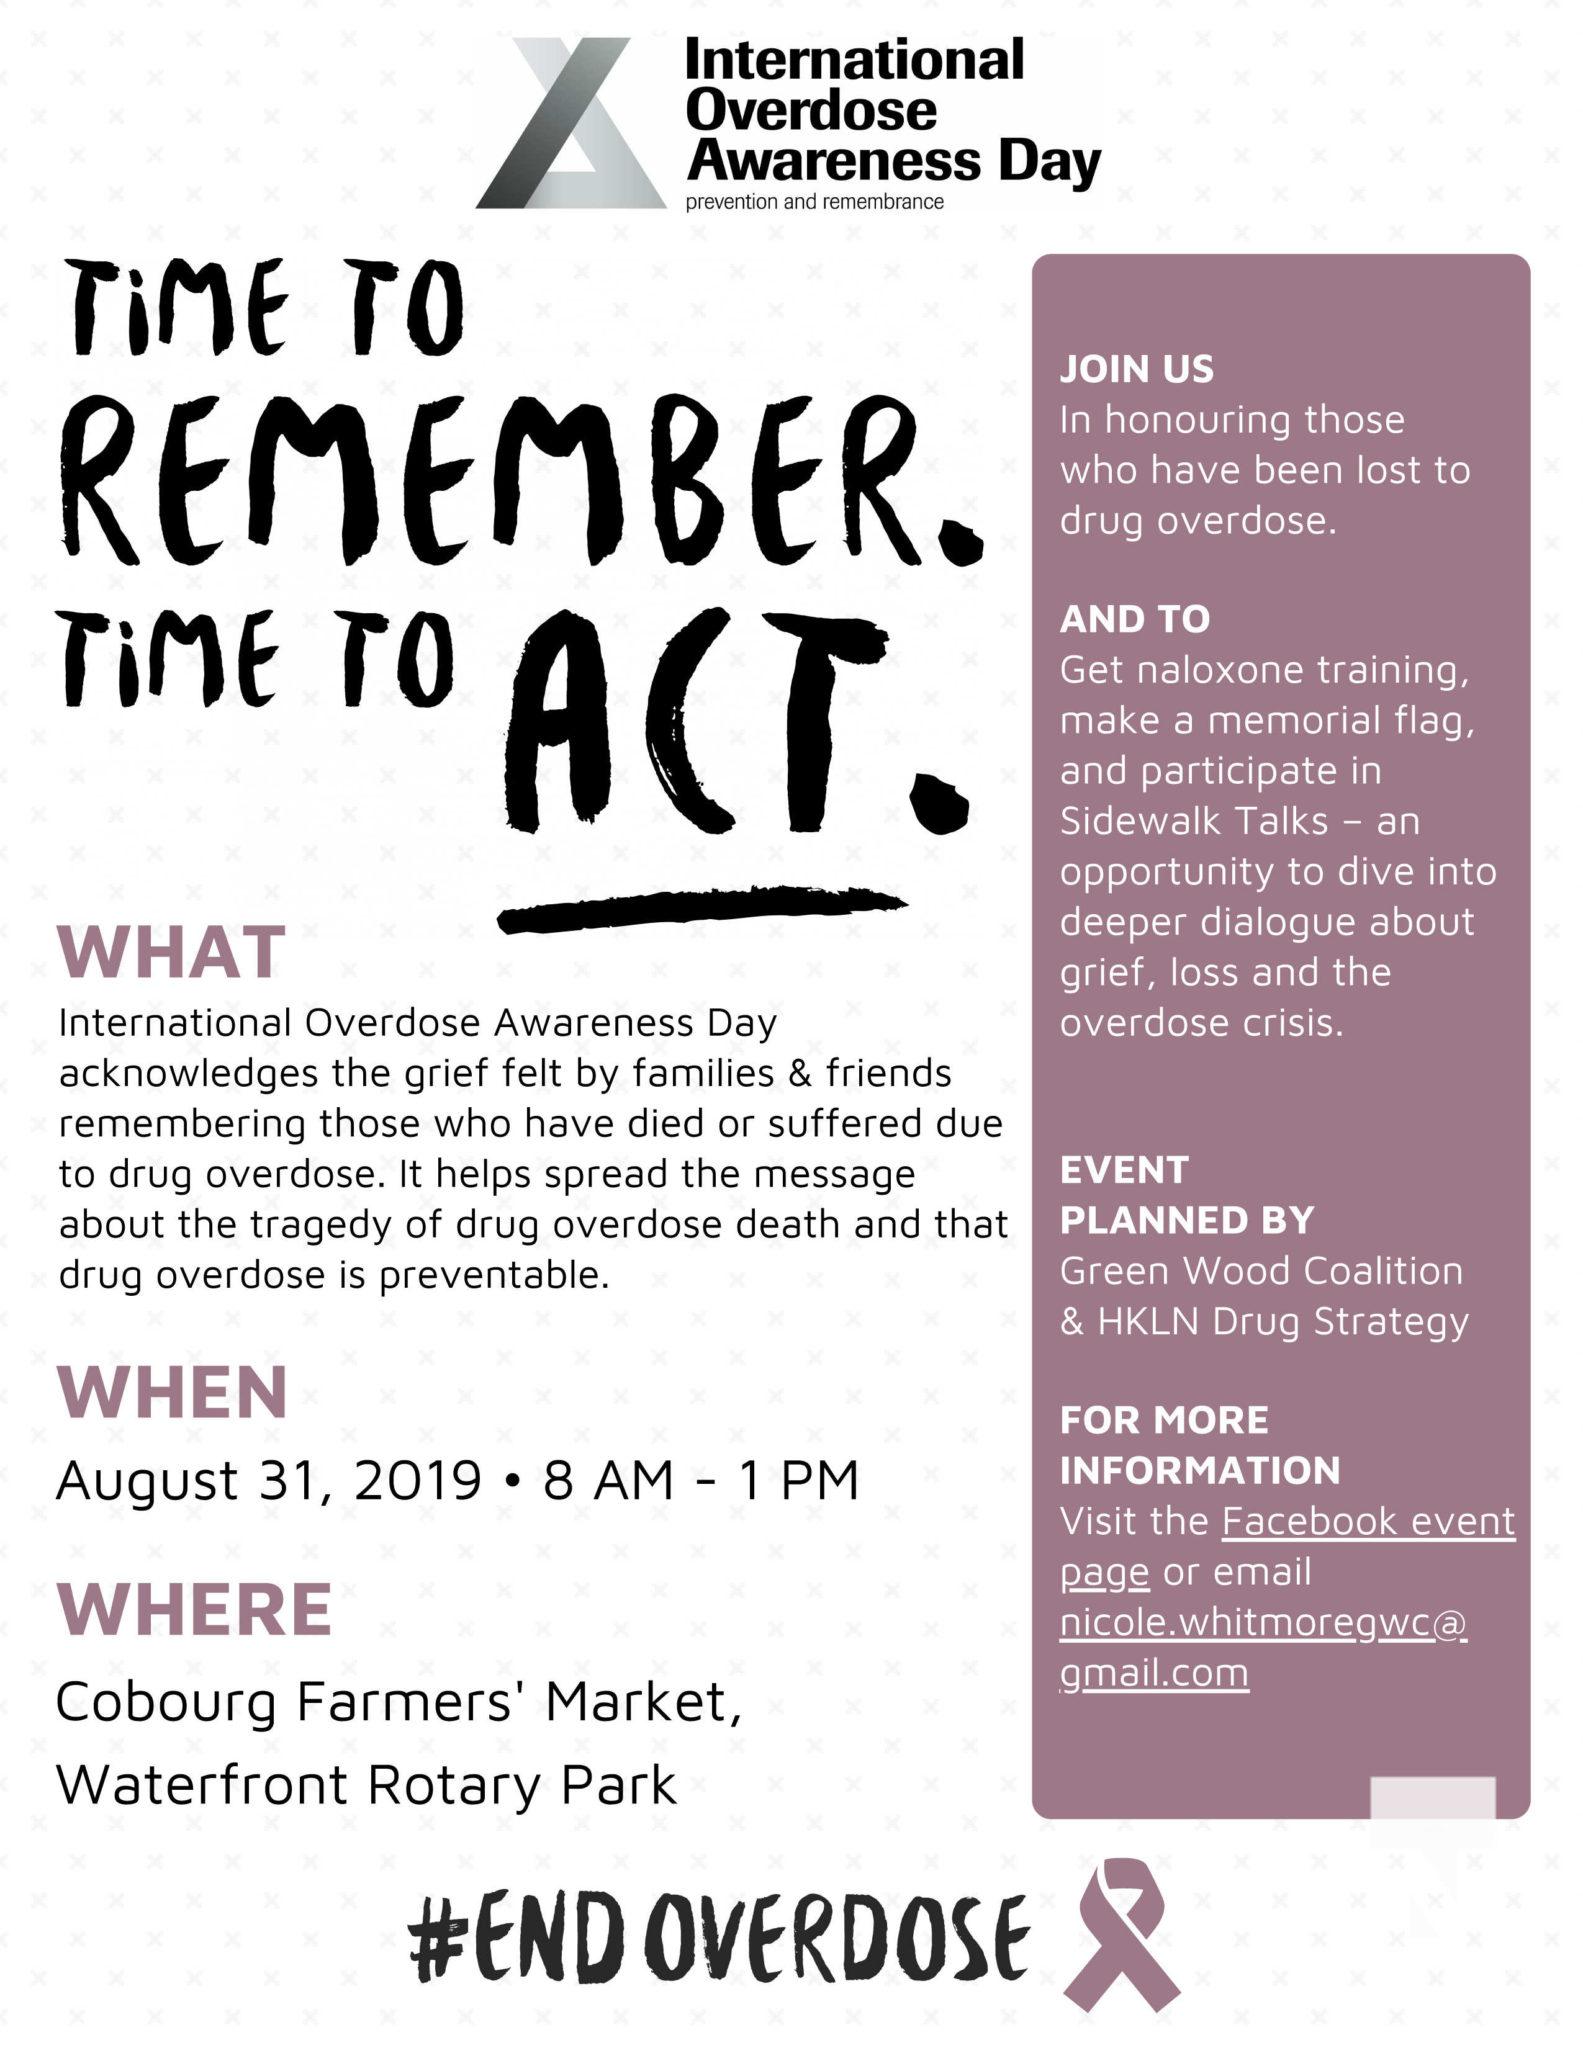 Last Sunday In August Felt More Like >> Green Wood Hosts International Overdose Awareness Day Event Aug 31